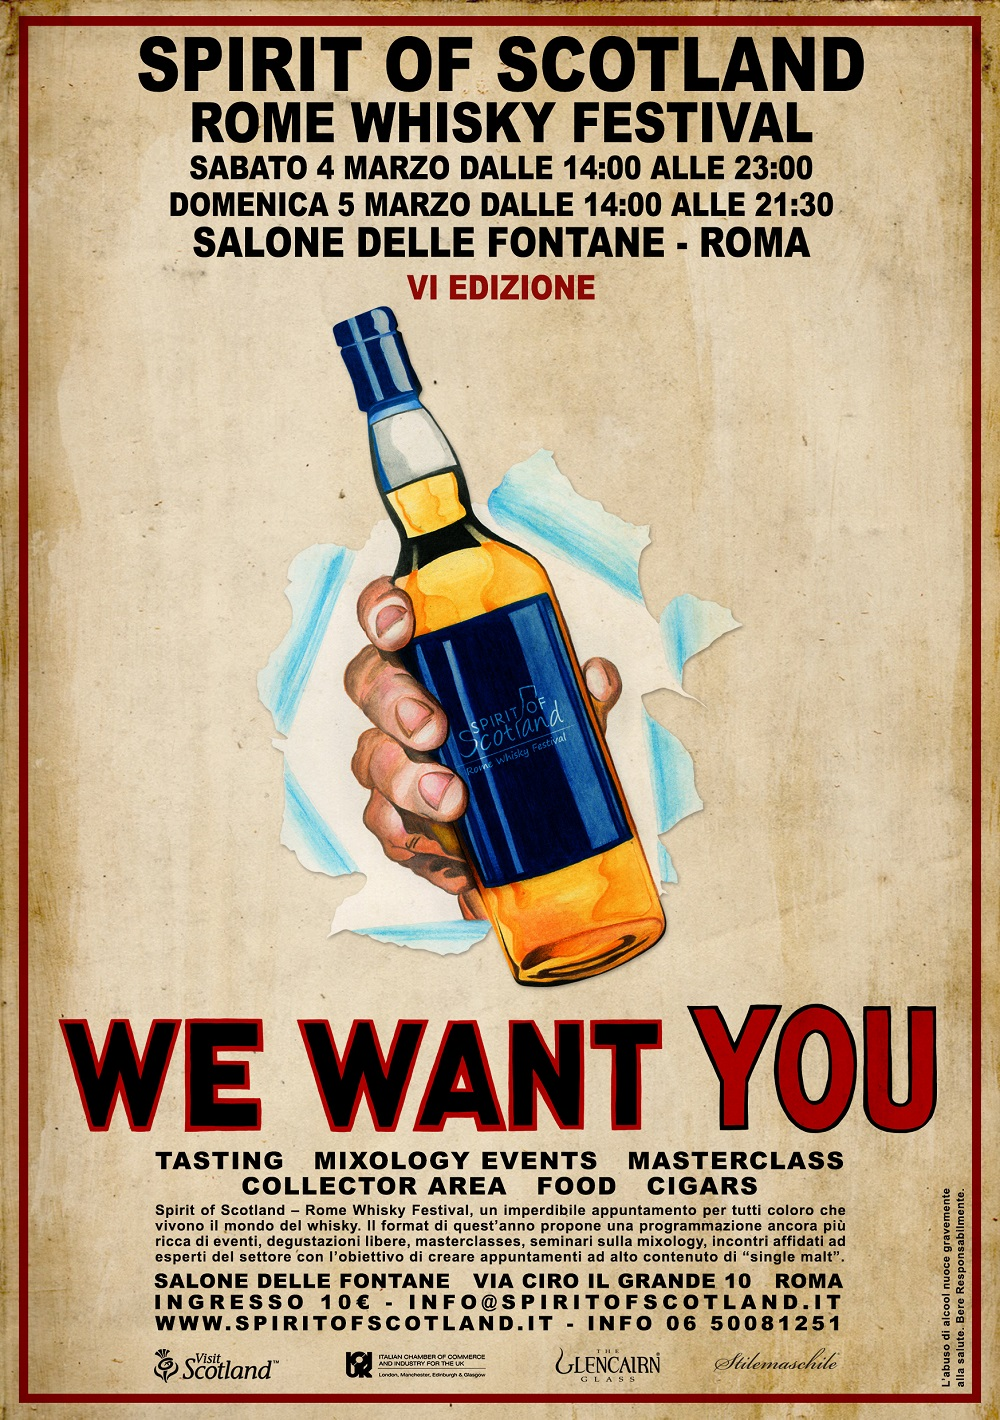 locandina Spirit of Scotland Rome Whisky Festival 2017 1